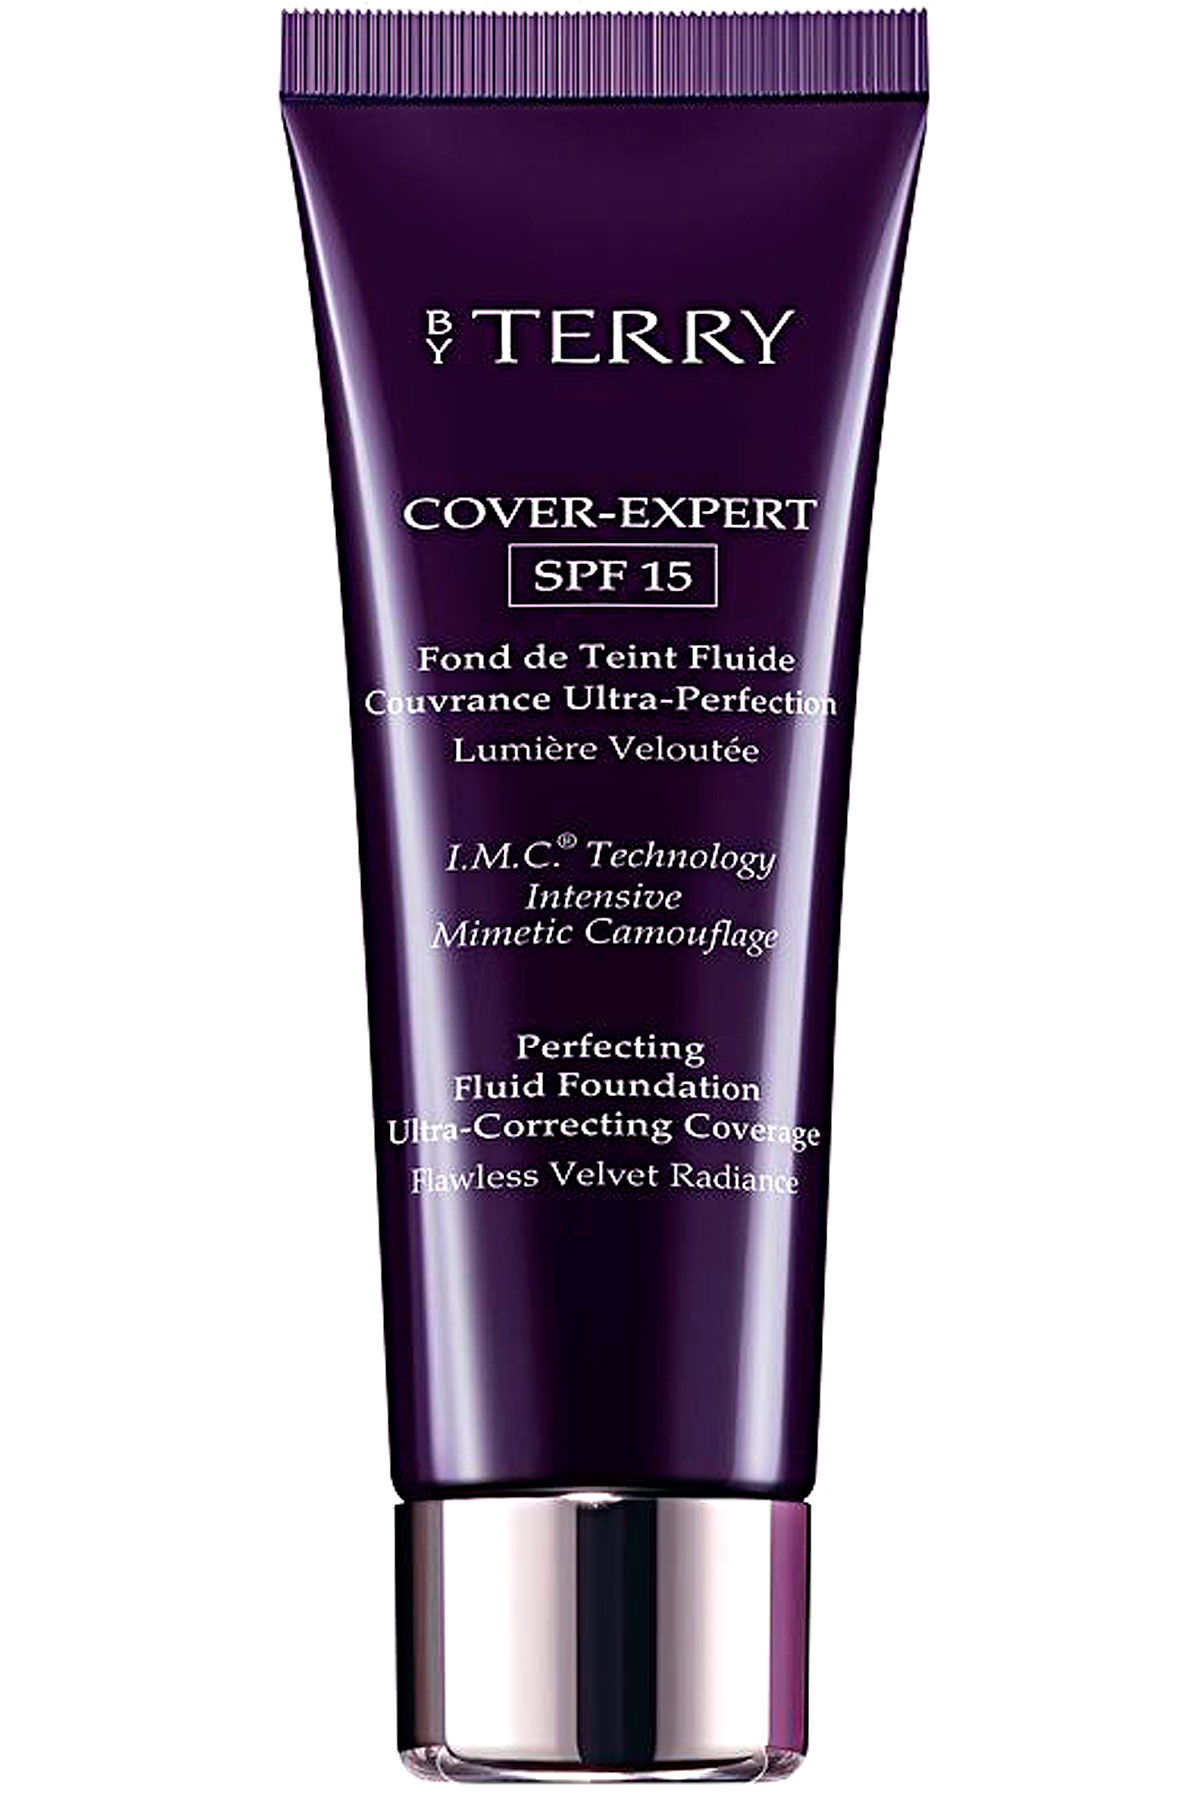 By Terry Makeup for Women, Cover-expert Spf15 - N.7 Vanilla Beige - 35 Ml, Vanilla Beige, 2019, 35 ml